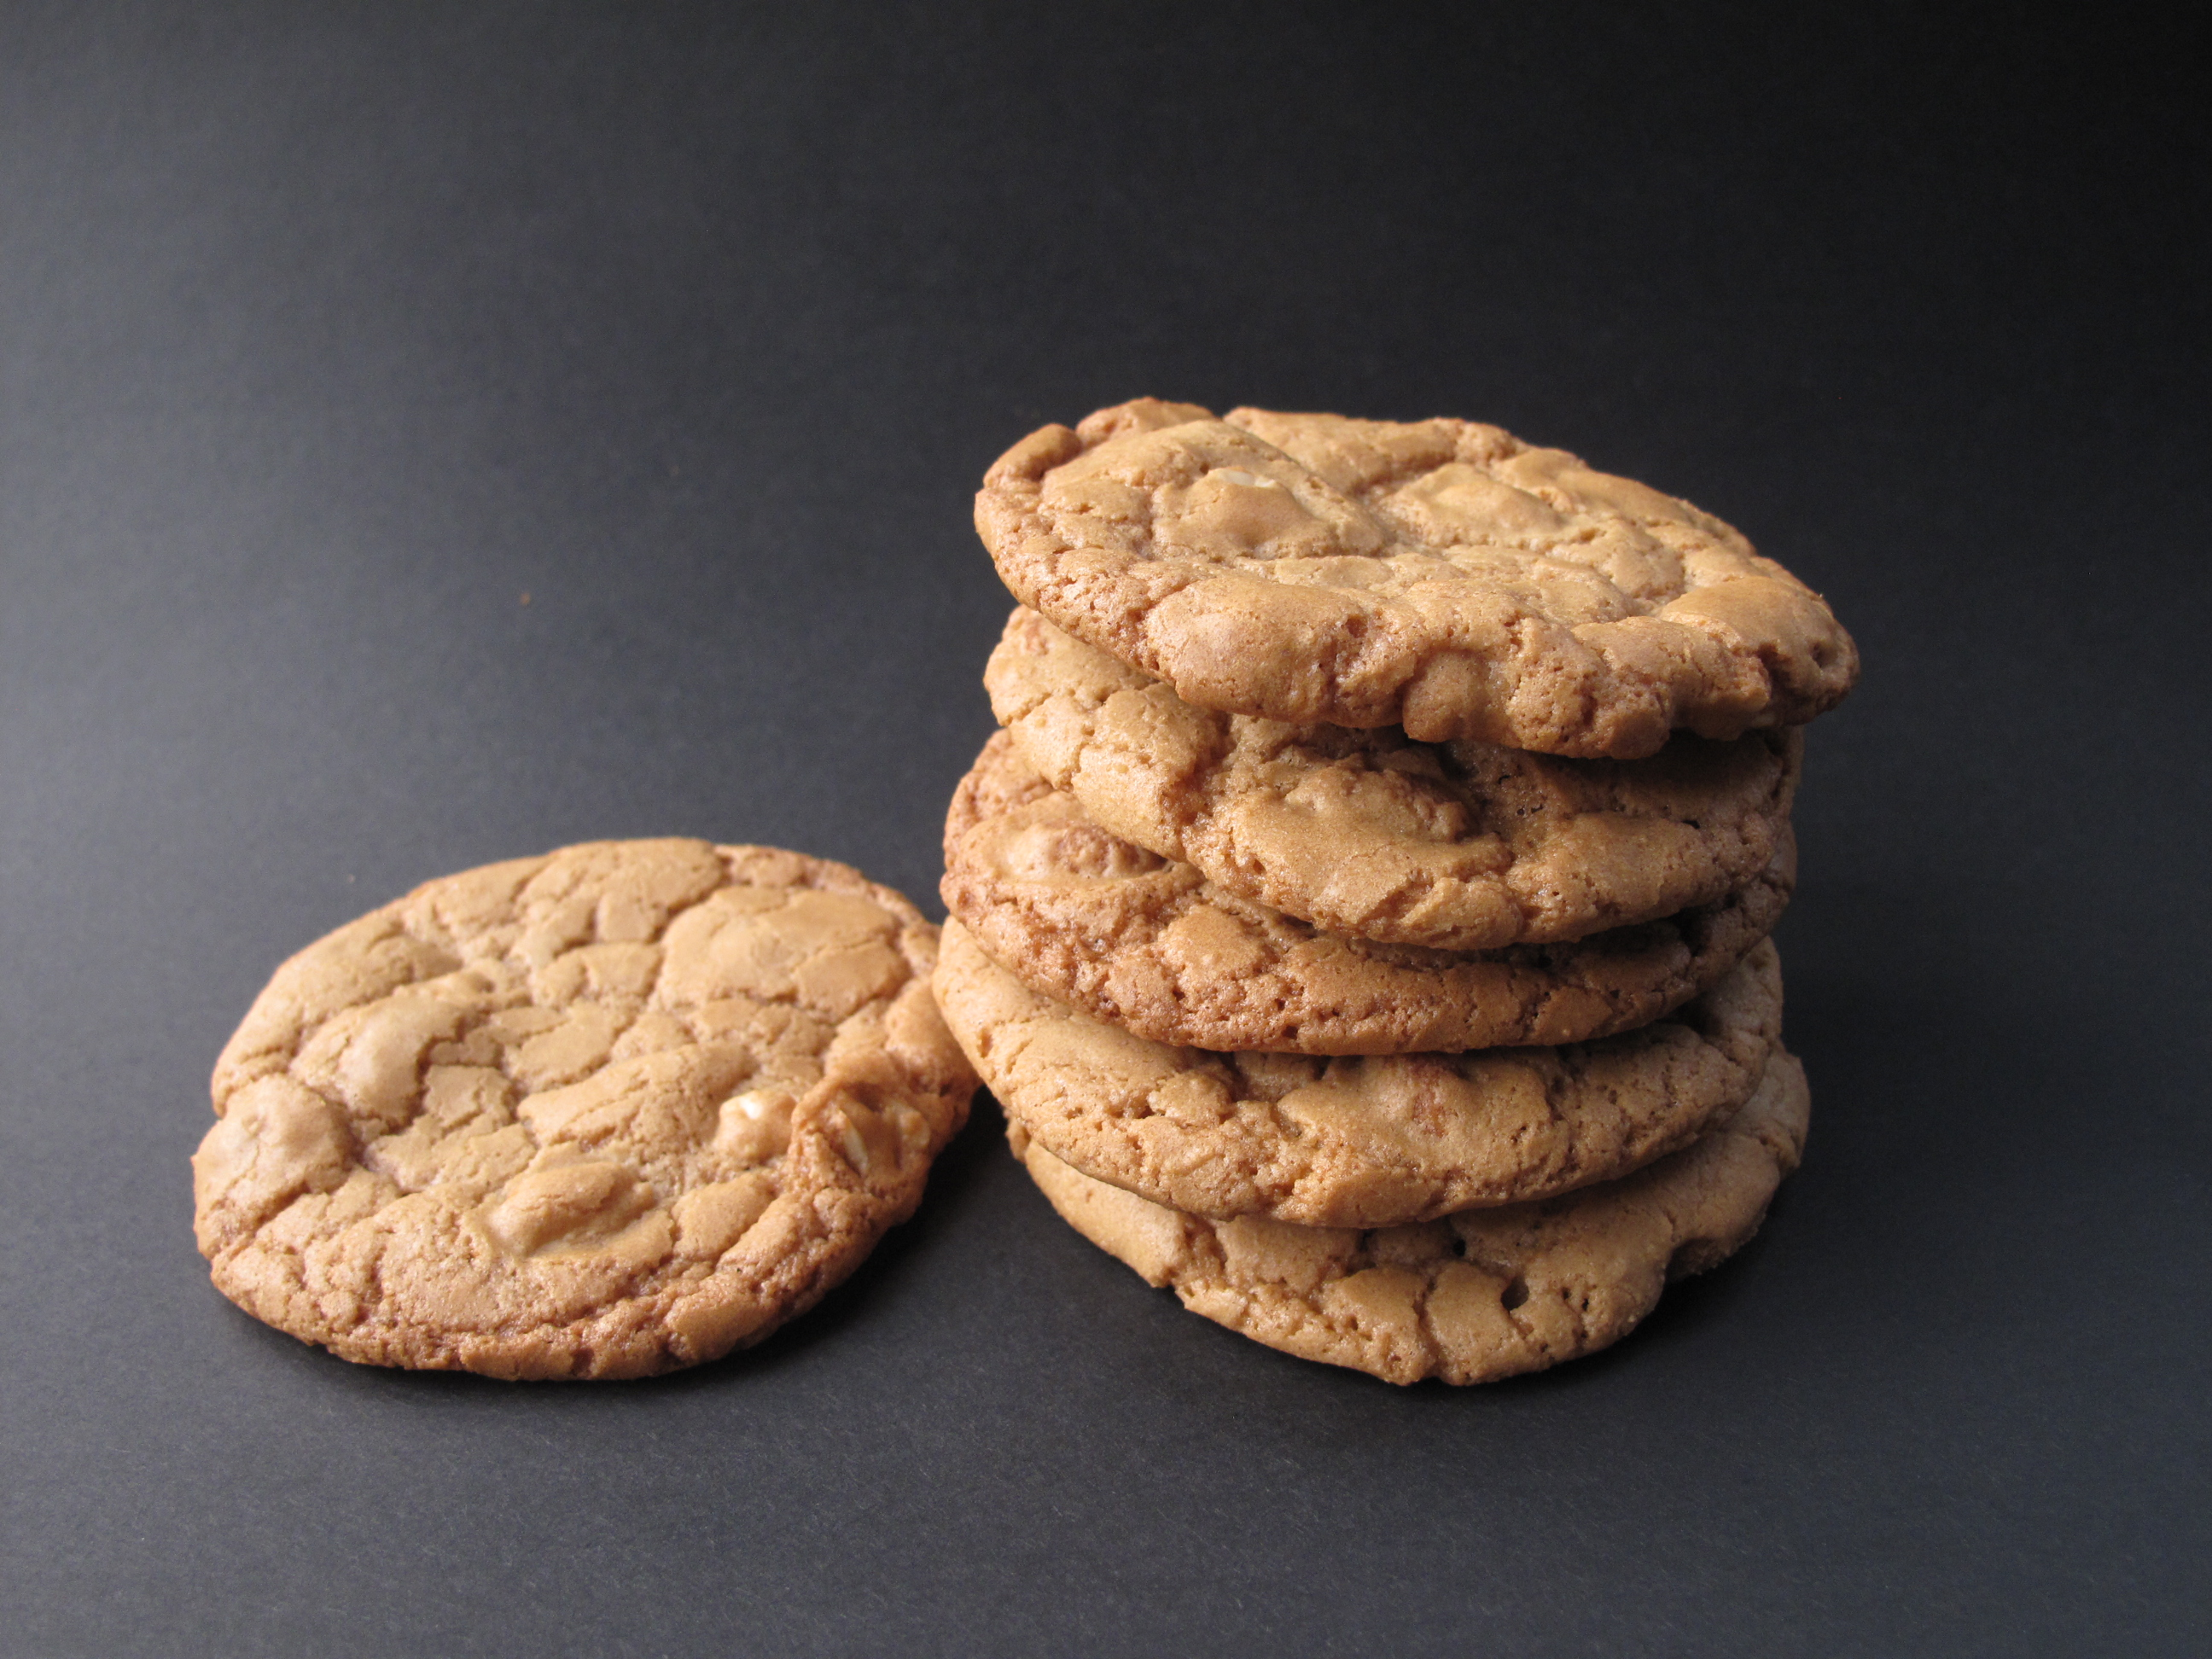 Honey-Roasted Peanut Cookies - The Monday Box